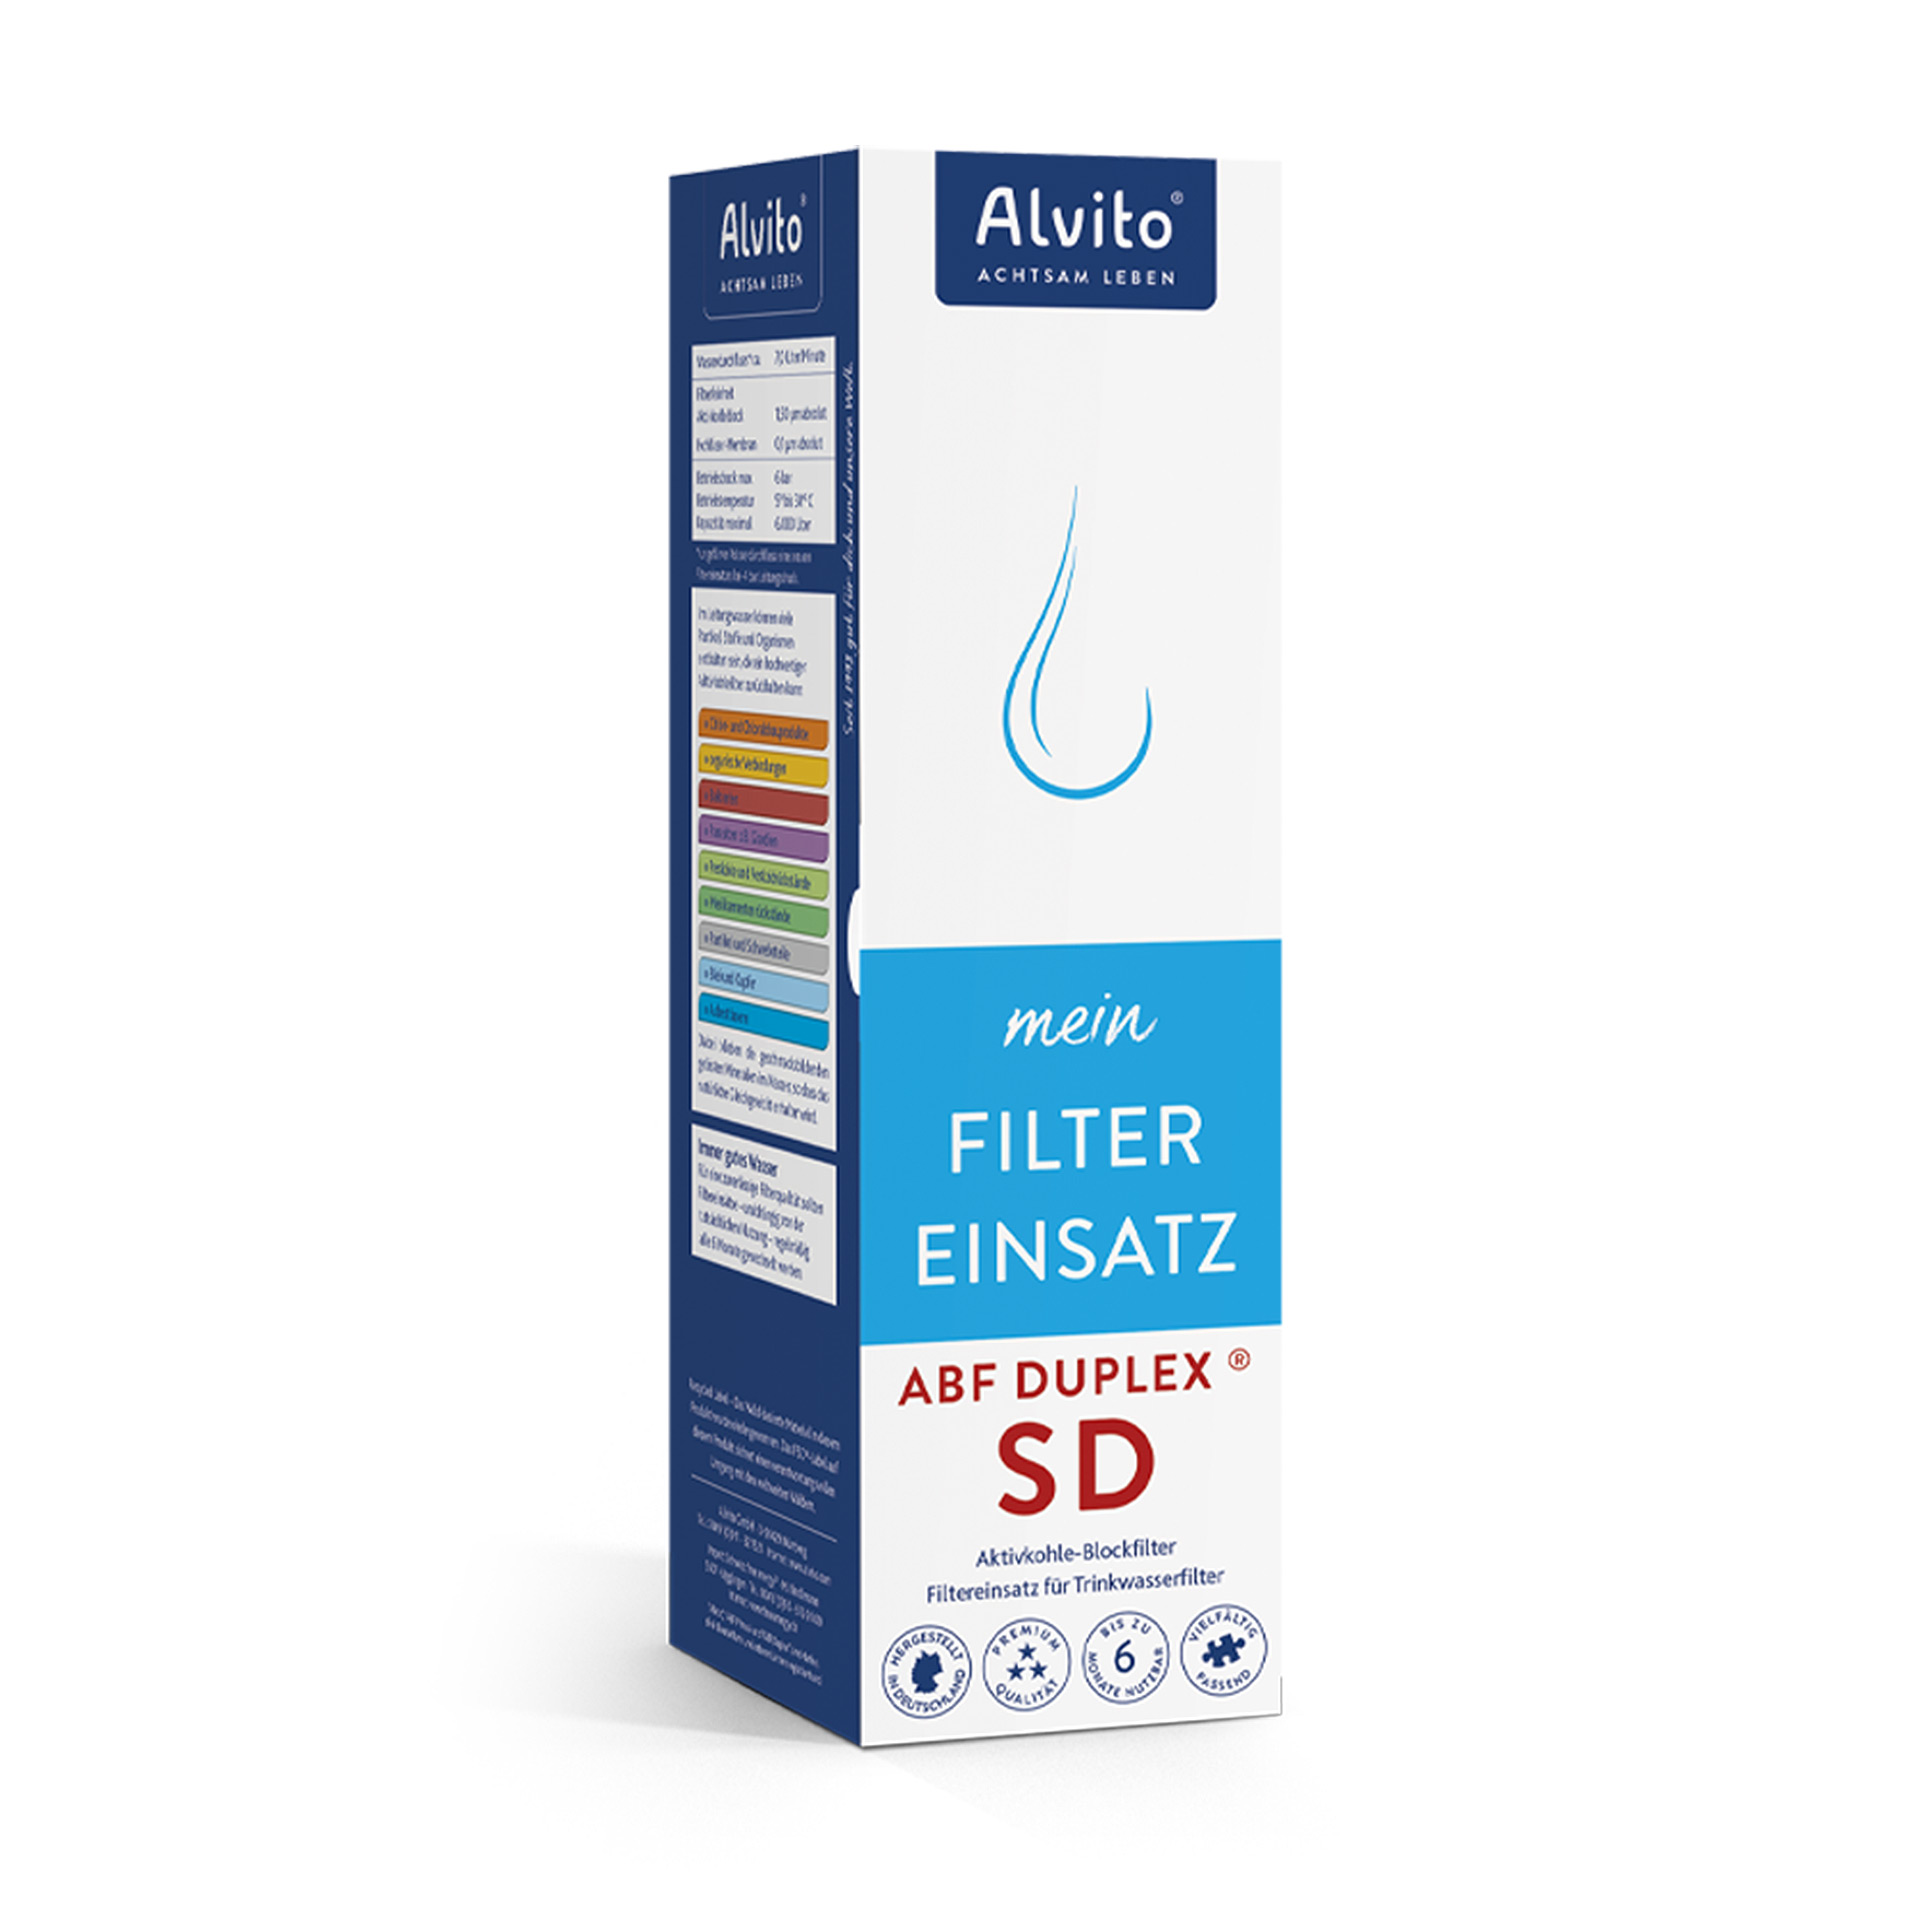 Alvito Filtereinsatz ABF Duplex SD